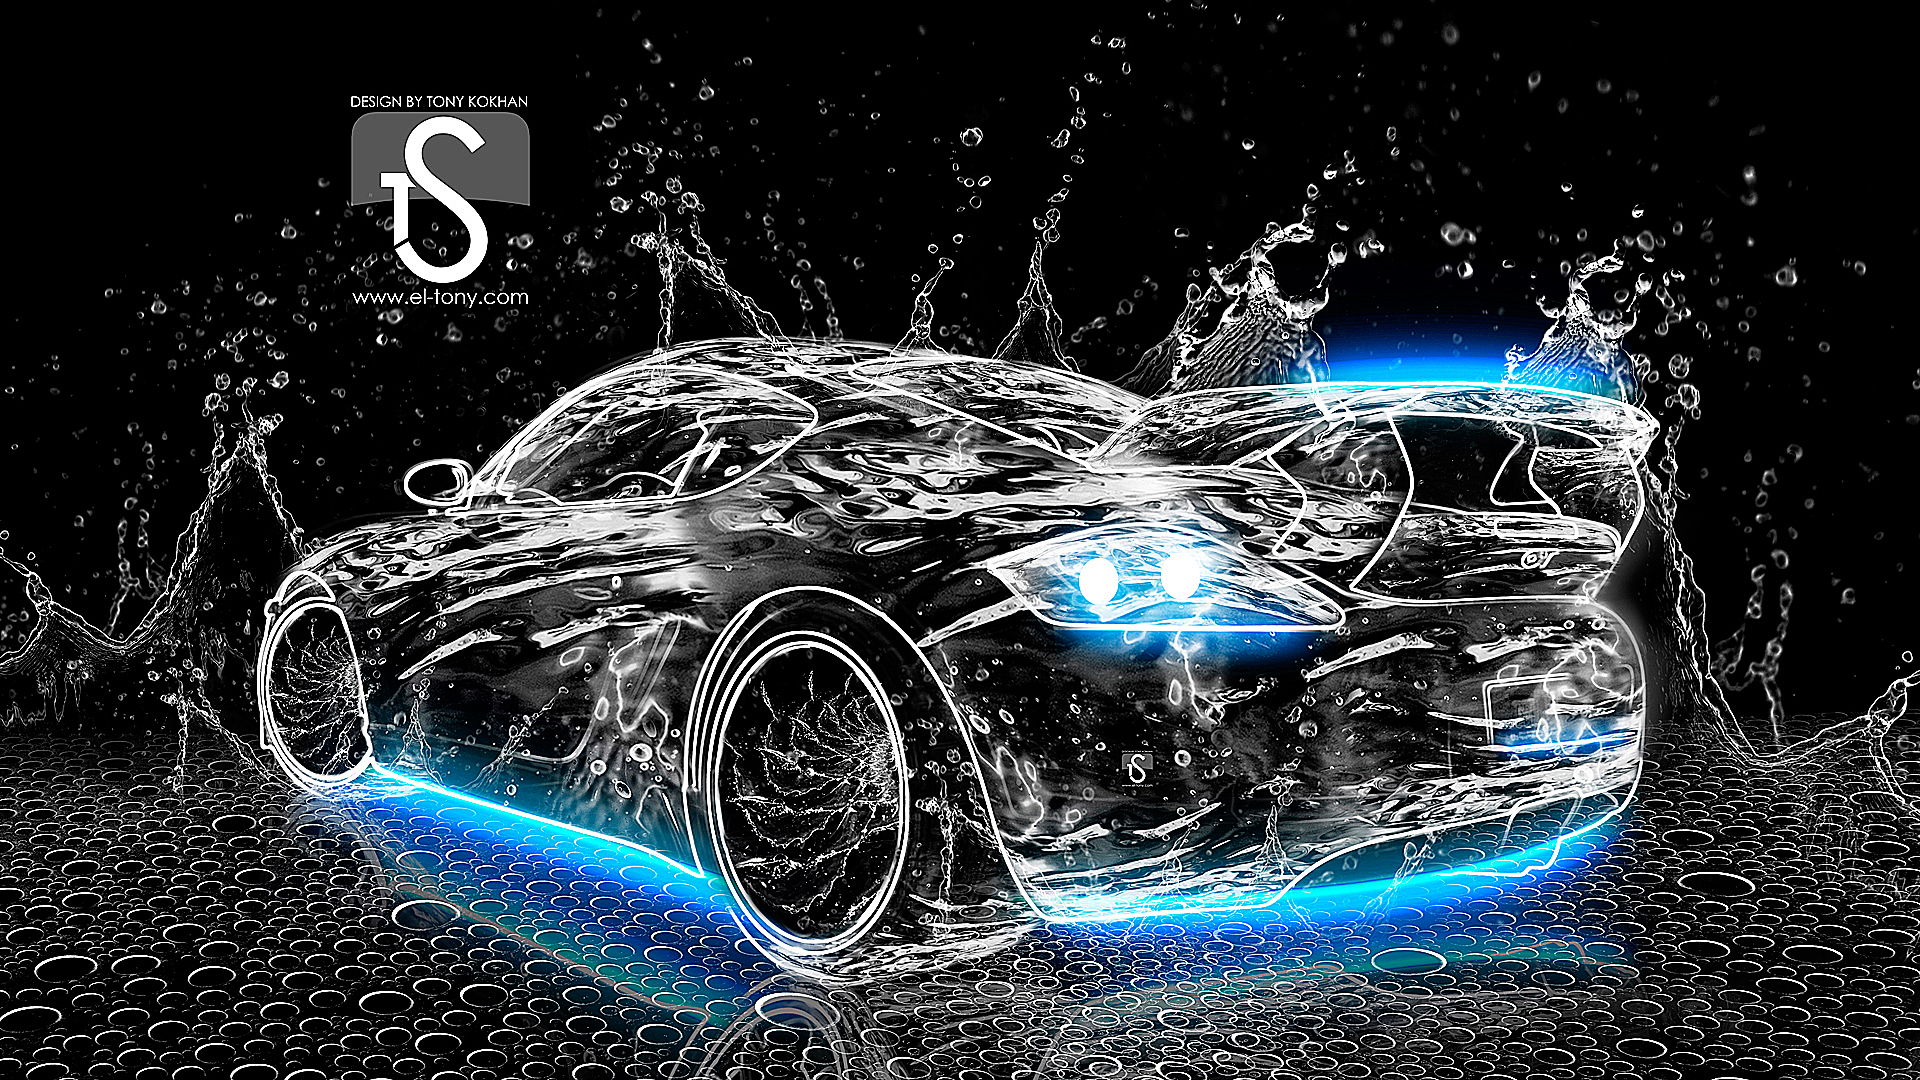 Water Neon Car 1920x1080 [wwwel tonycom] 1920x1080